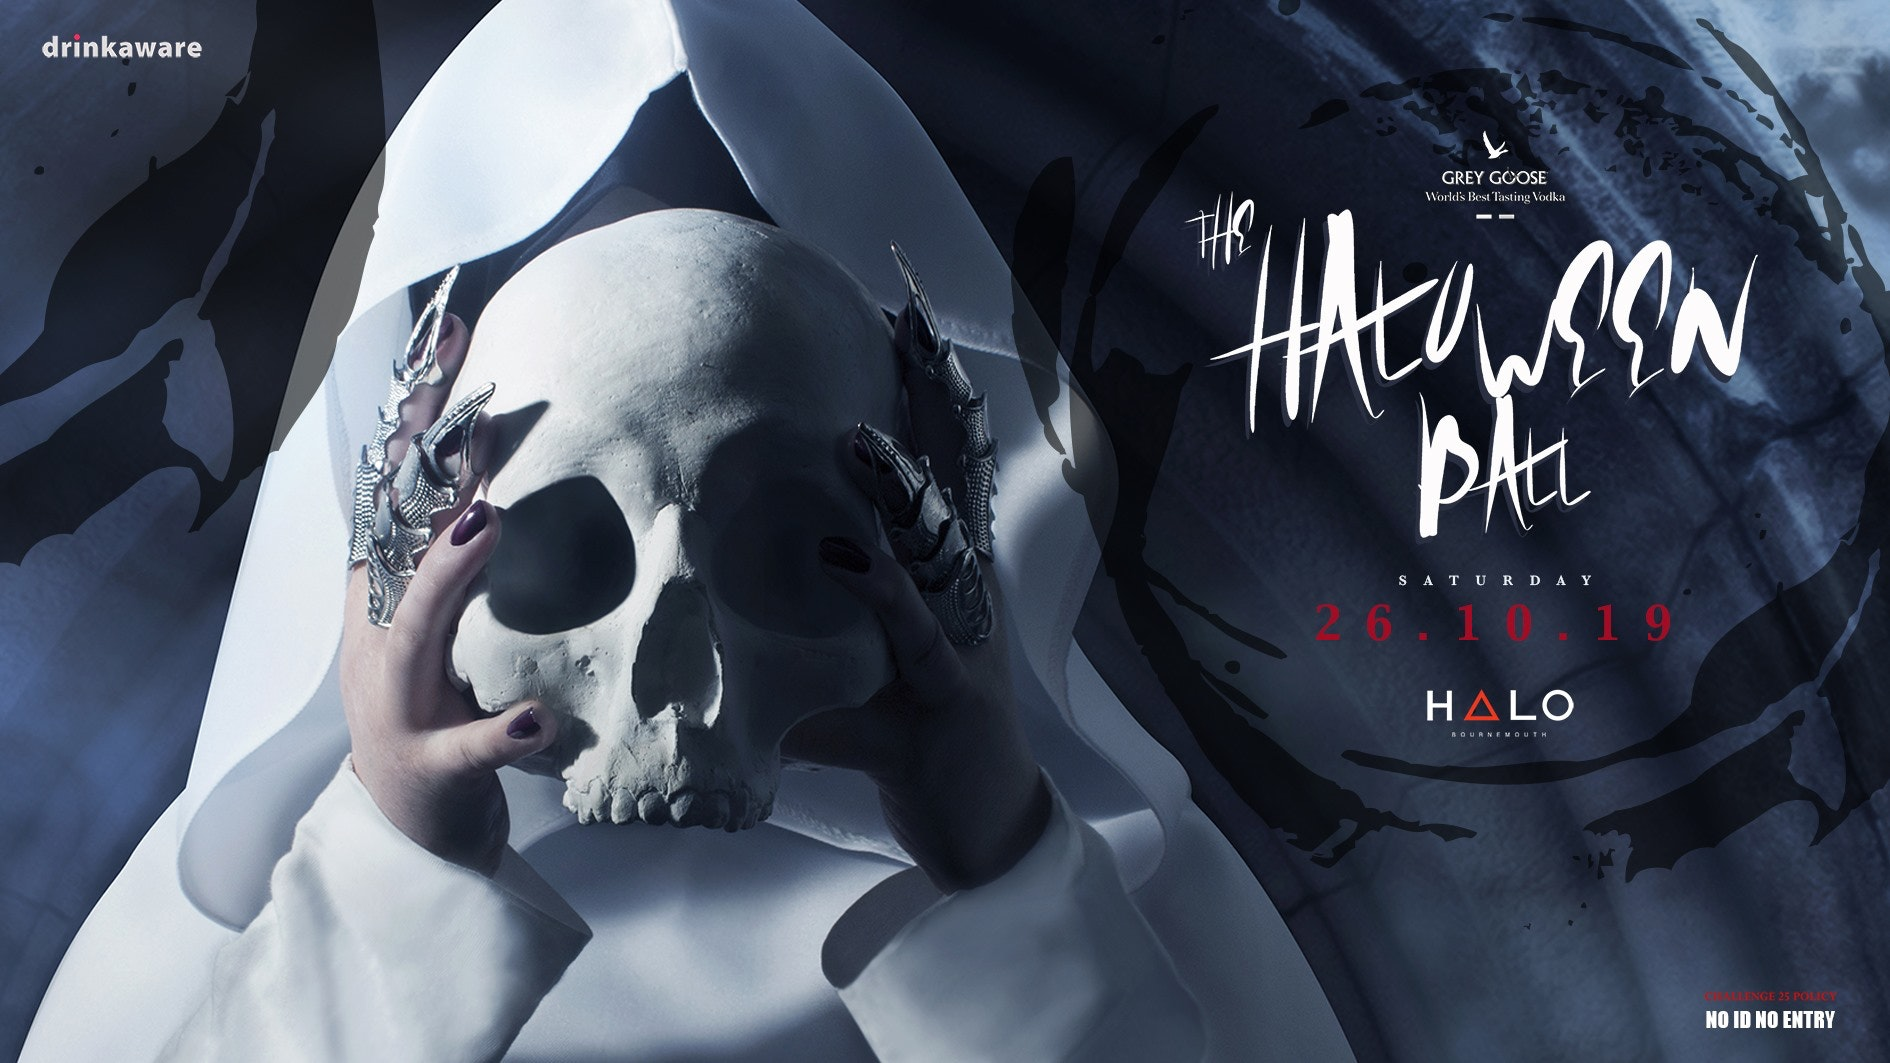 The HaloWeen Ball 2019